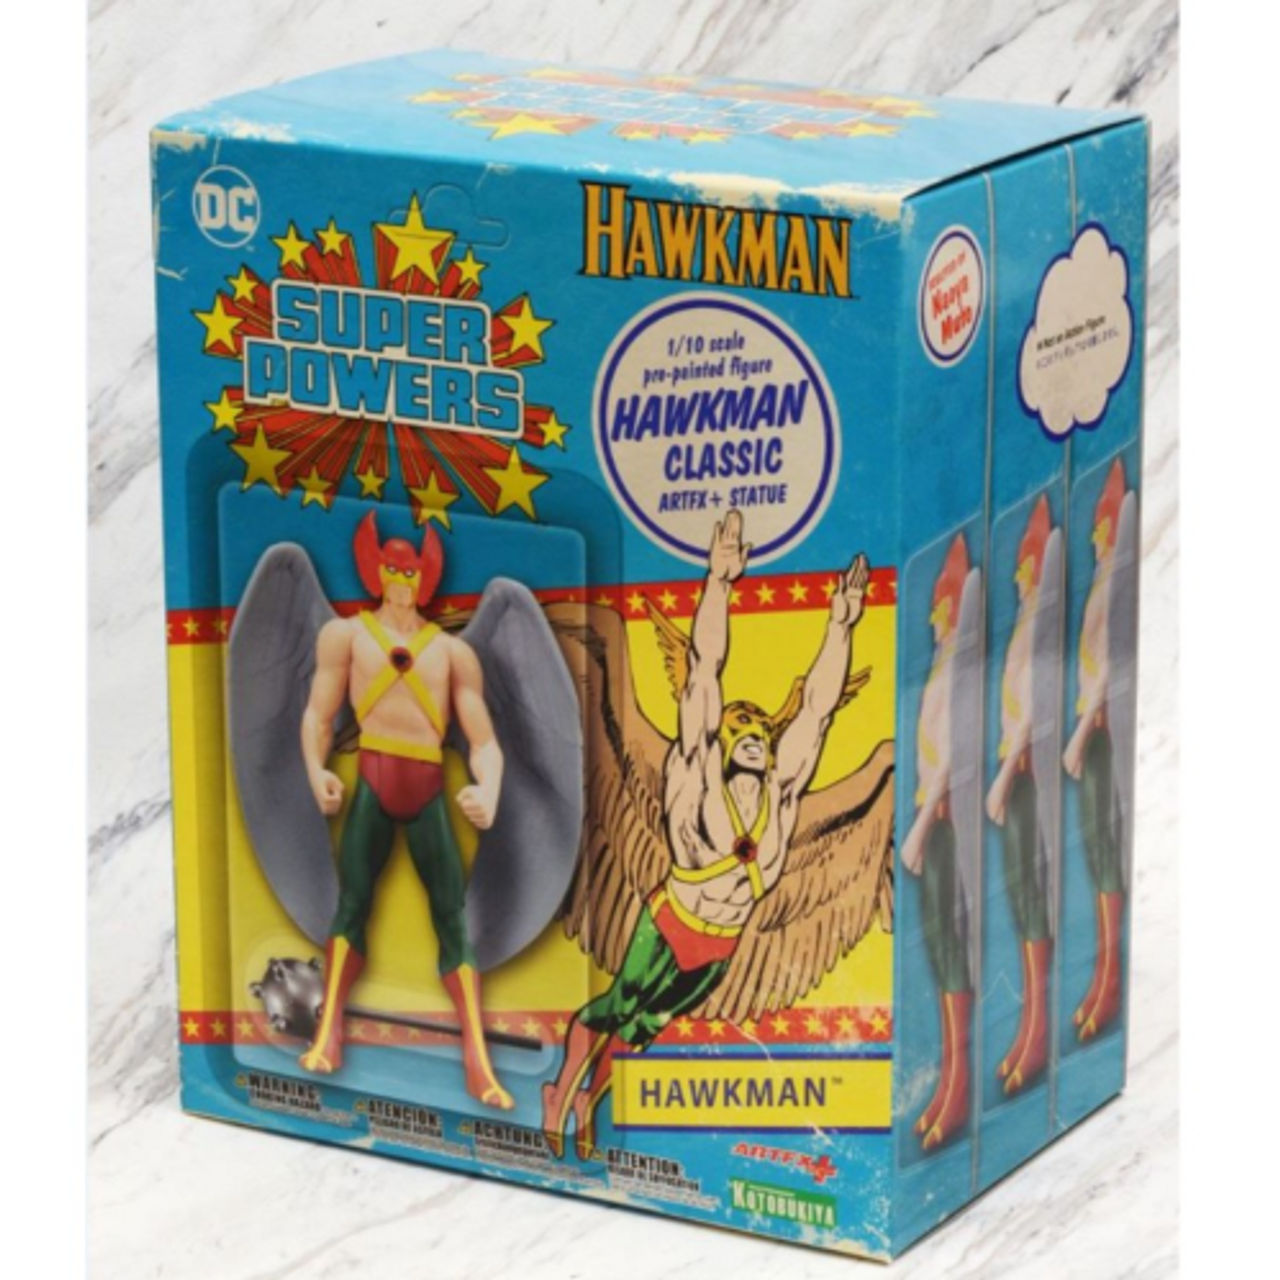 DC Comics ARTFX+ Statue - HAWKMAN 'Super Powers' 1/10 scale